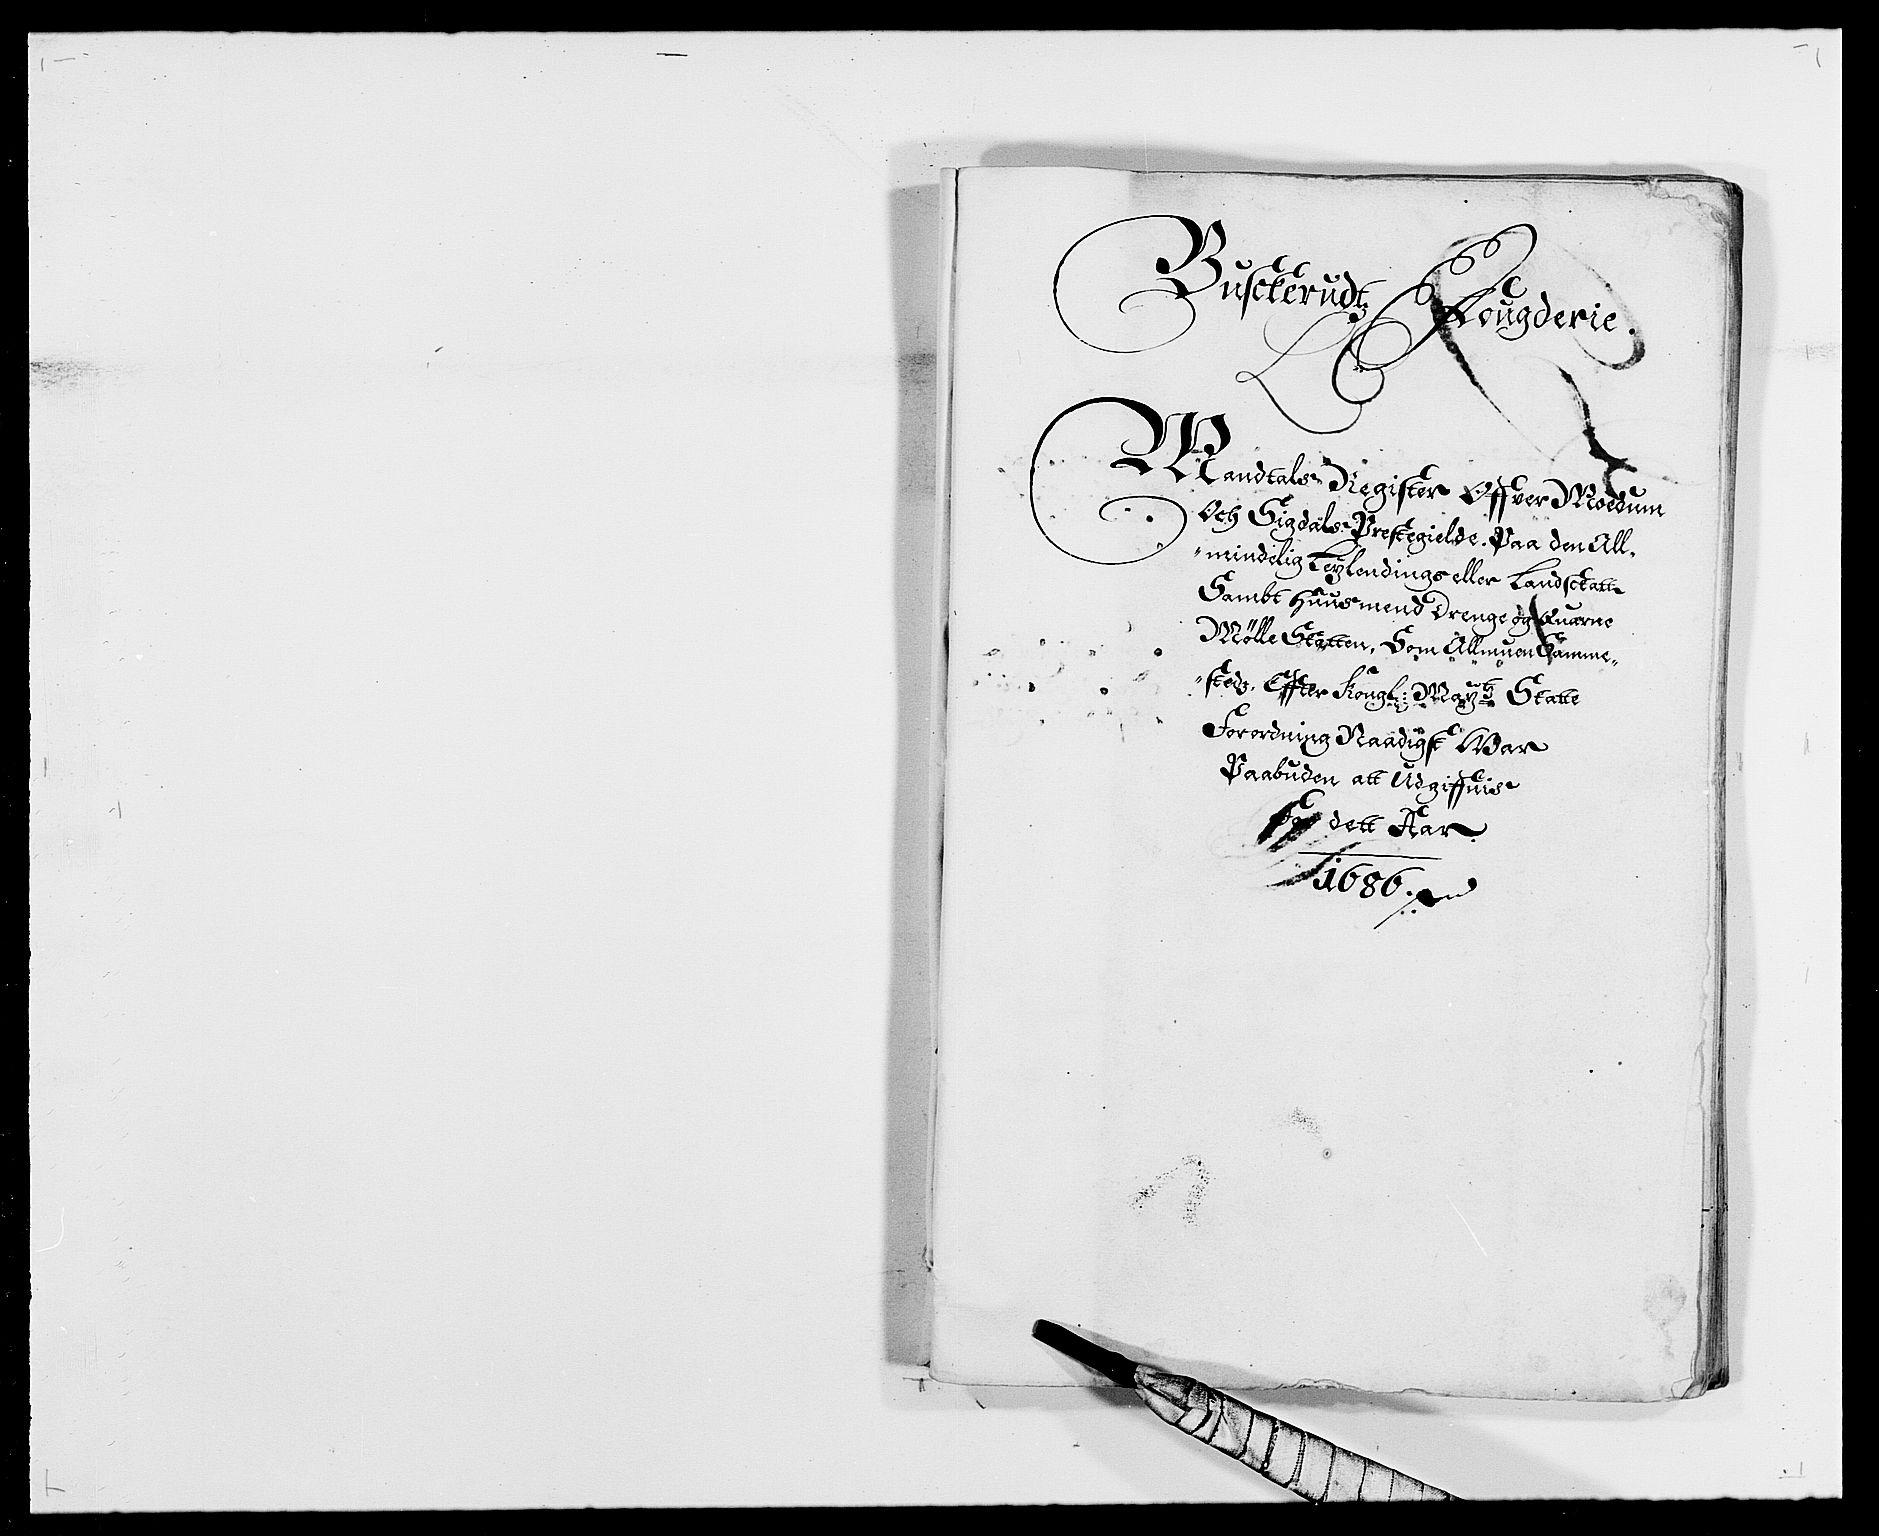 RA, Rentekammeret inntil 1814, Reviderte regnskaper, Fogderegnskap, R25/L1678: Fogderegnskap Buskerud, 1685-1686, s. 258